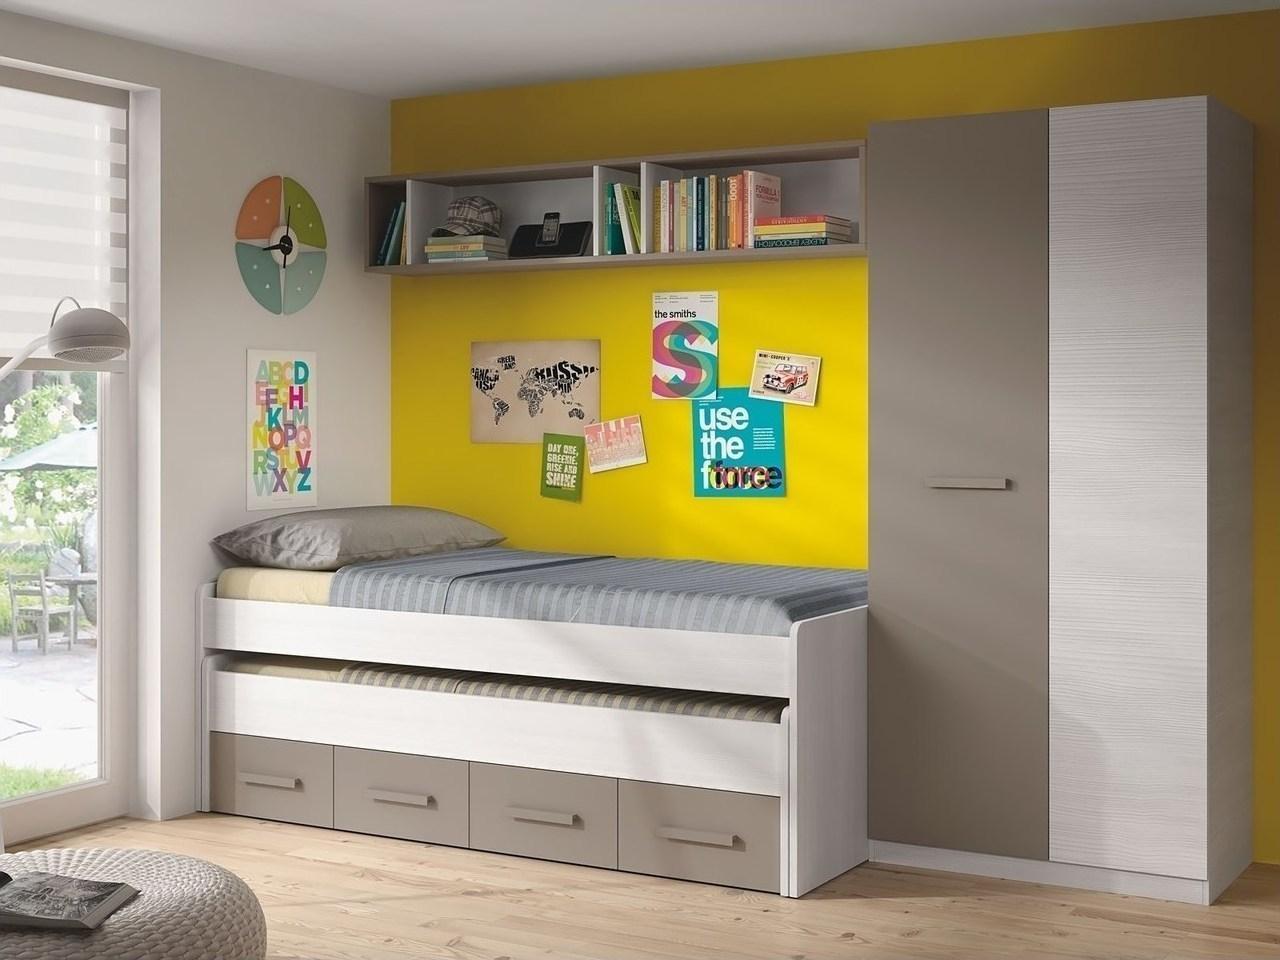 93bc2b63a2e ... συρομενα Ares Μονό Λευκό/Γκρι με Συρόμενο Κρεβάτι Skroutz.gr παιδικα  κρεβατια παιδικα κρεβατια συρομενα Έπιπλα Μπακό παιδικά έπιπλα και παιδικό  δωμάτιο ...